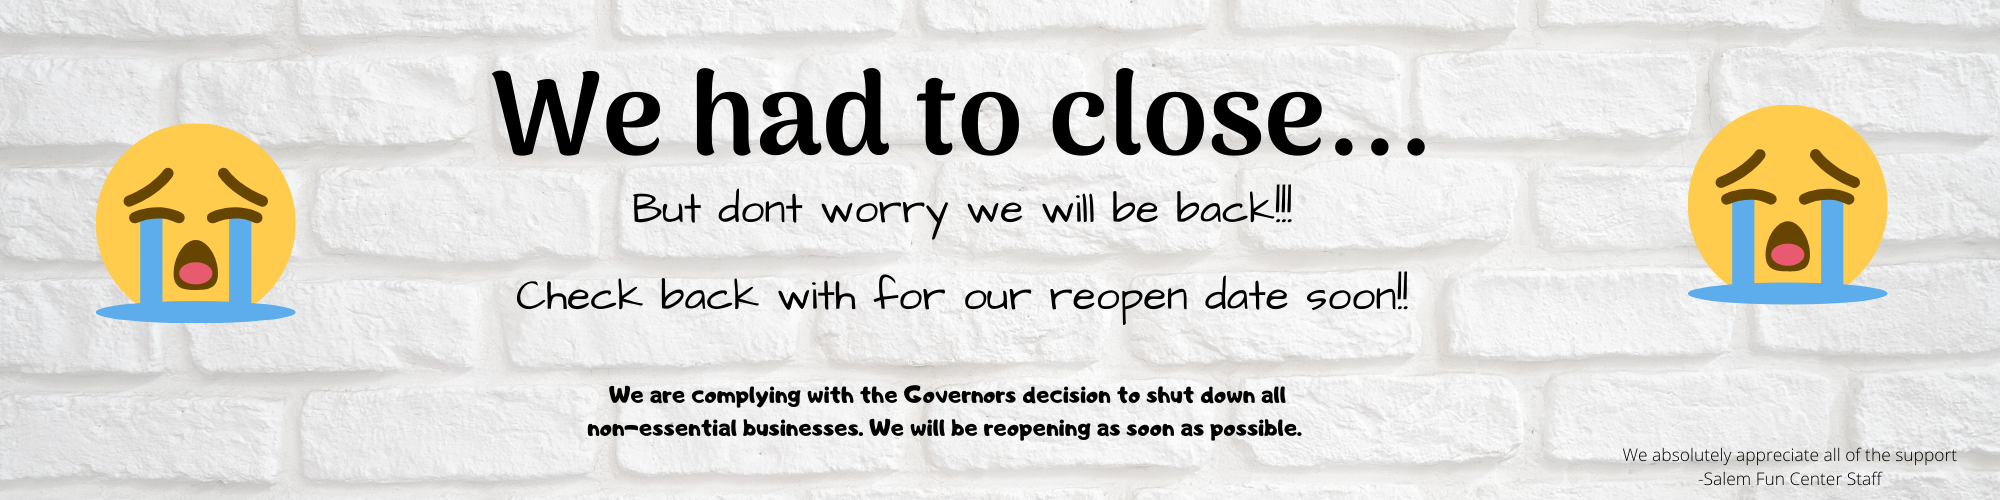 We had to close... (4)